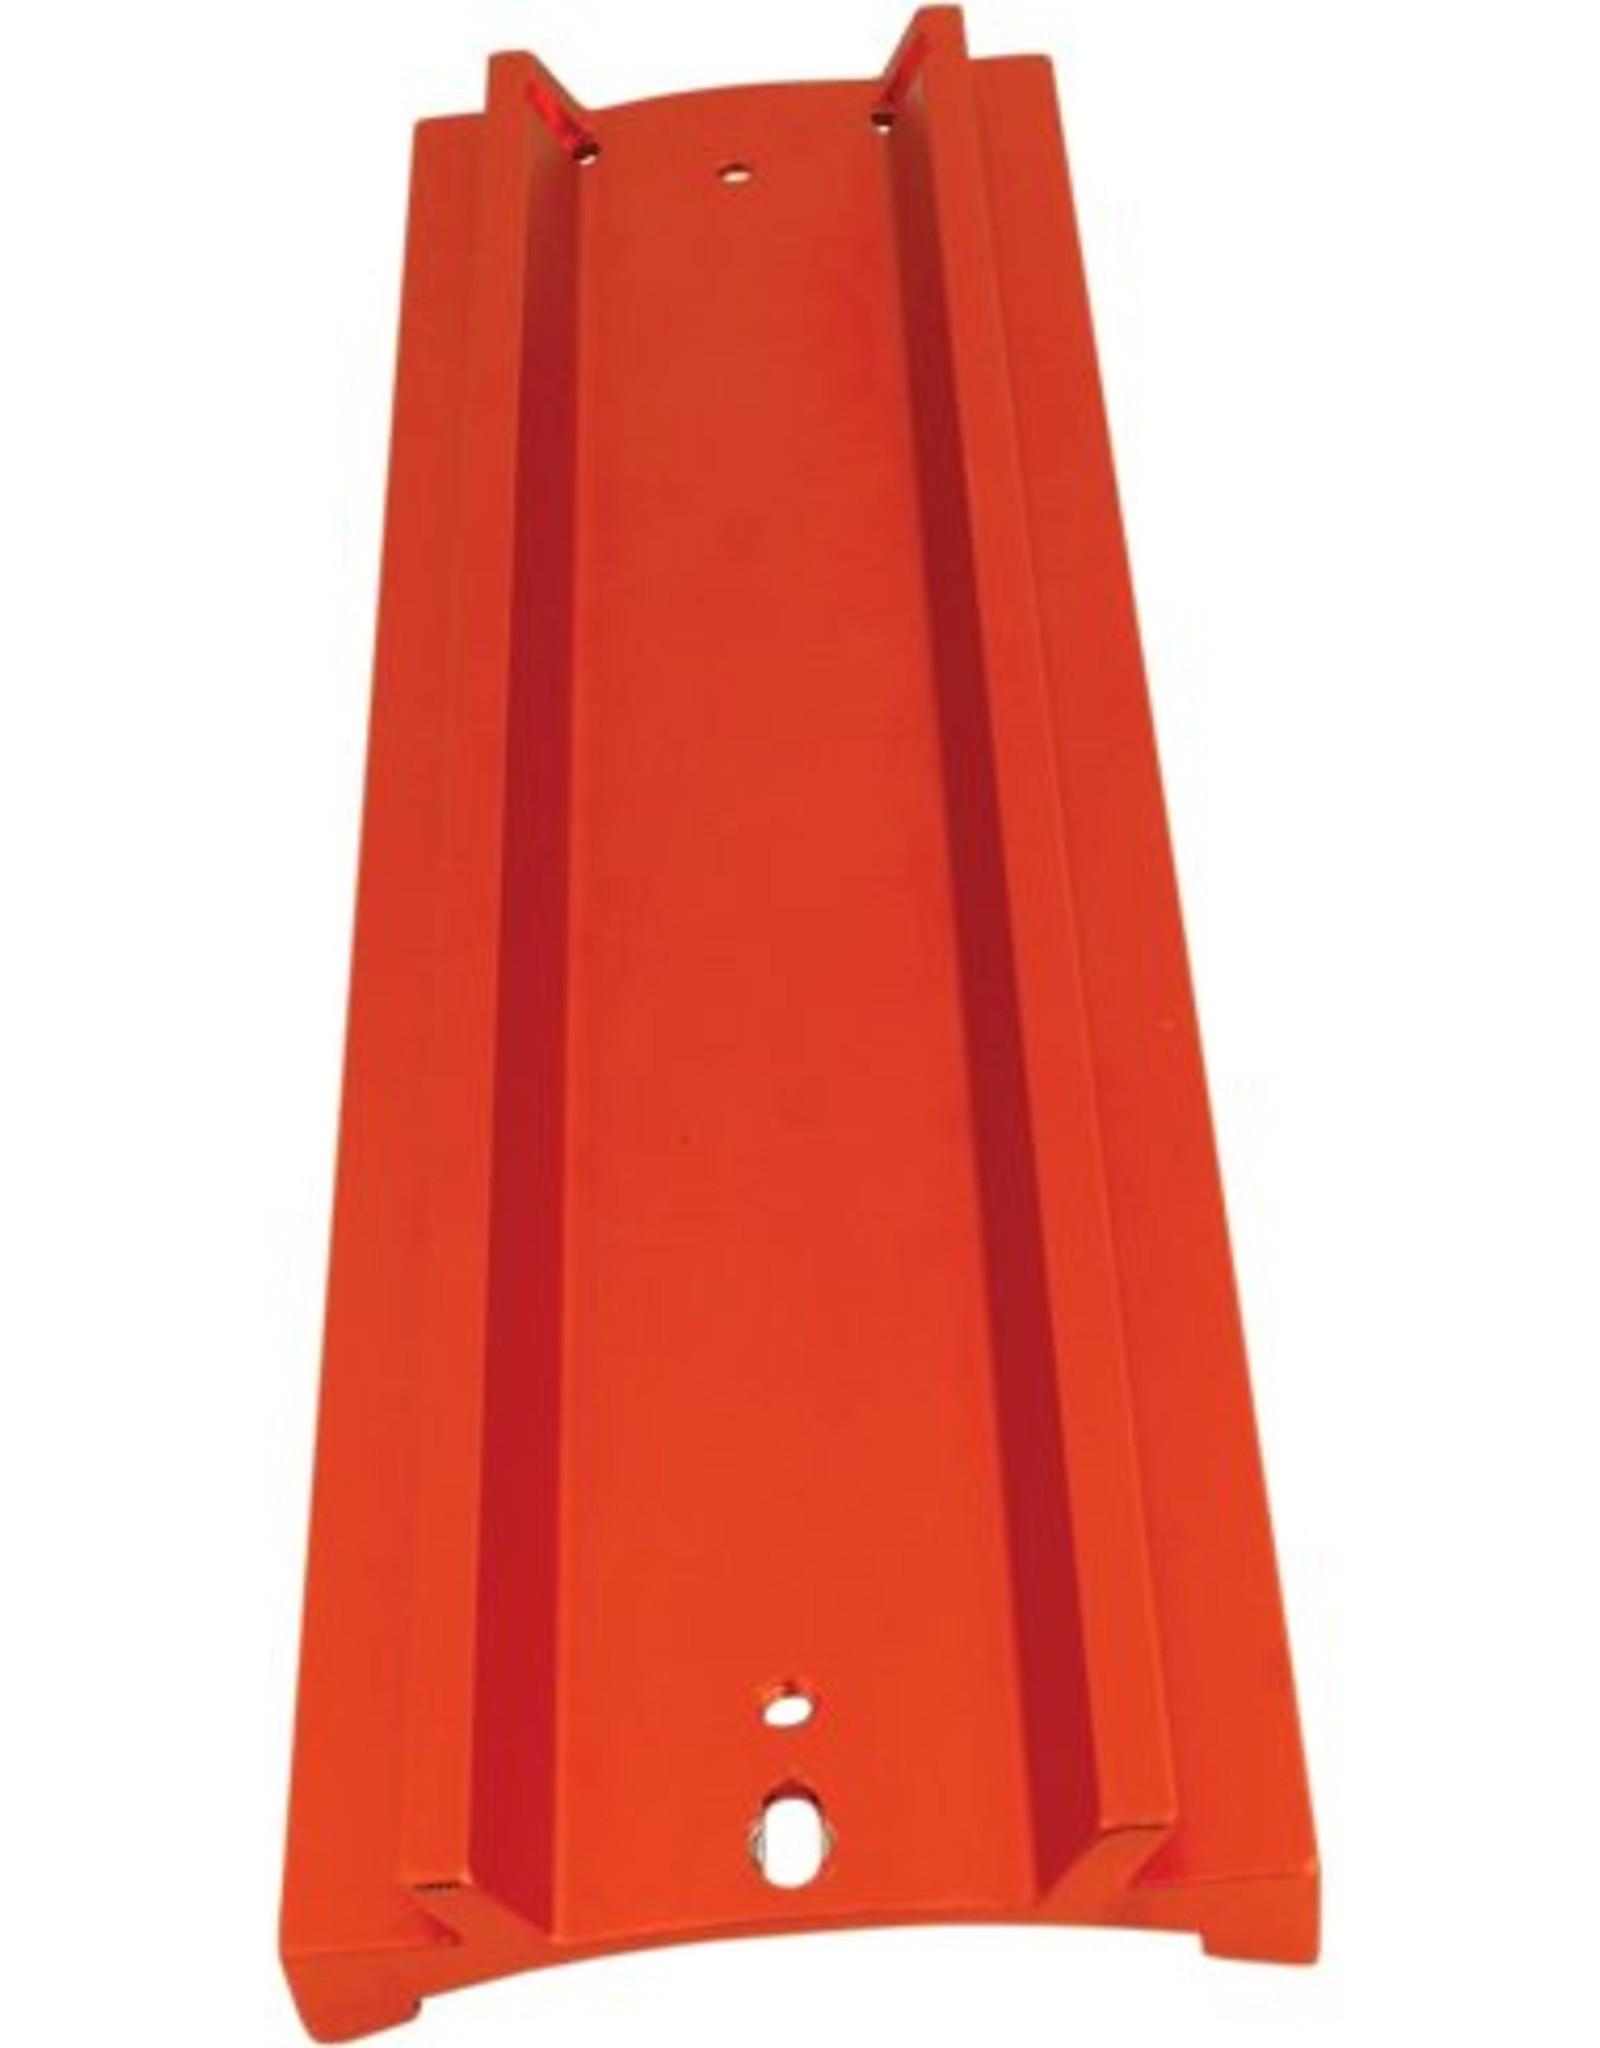 Celestron Celestron 11-inch Dovetail bar (CGEM/CGX)